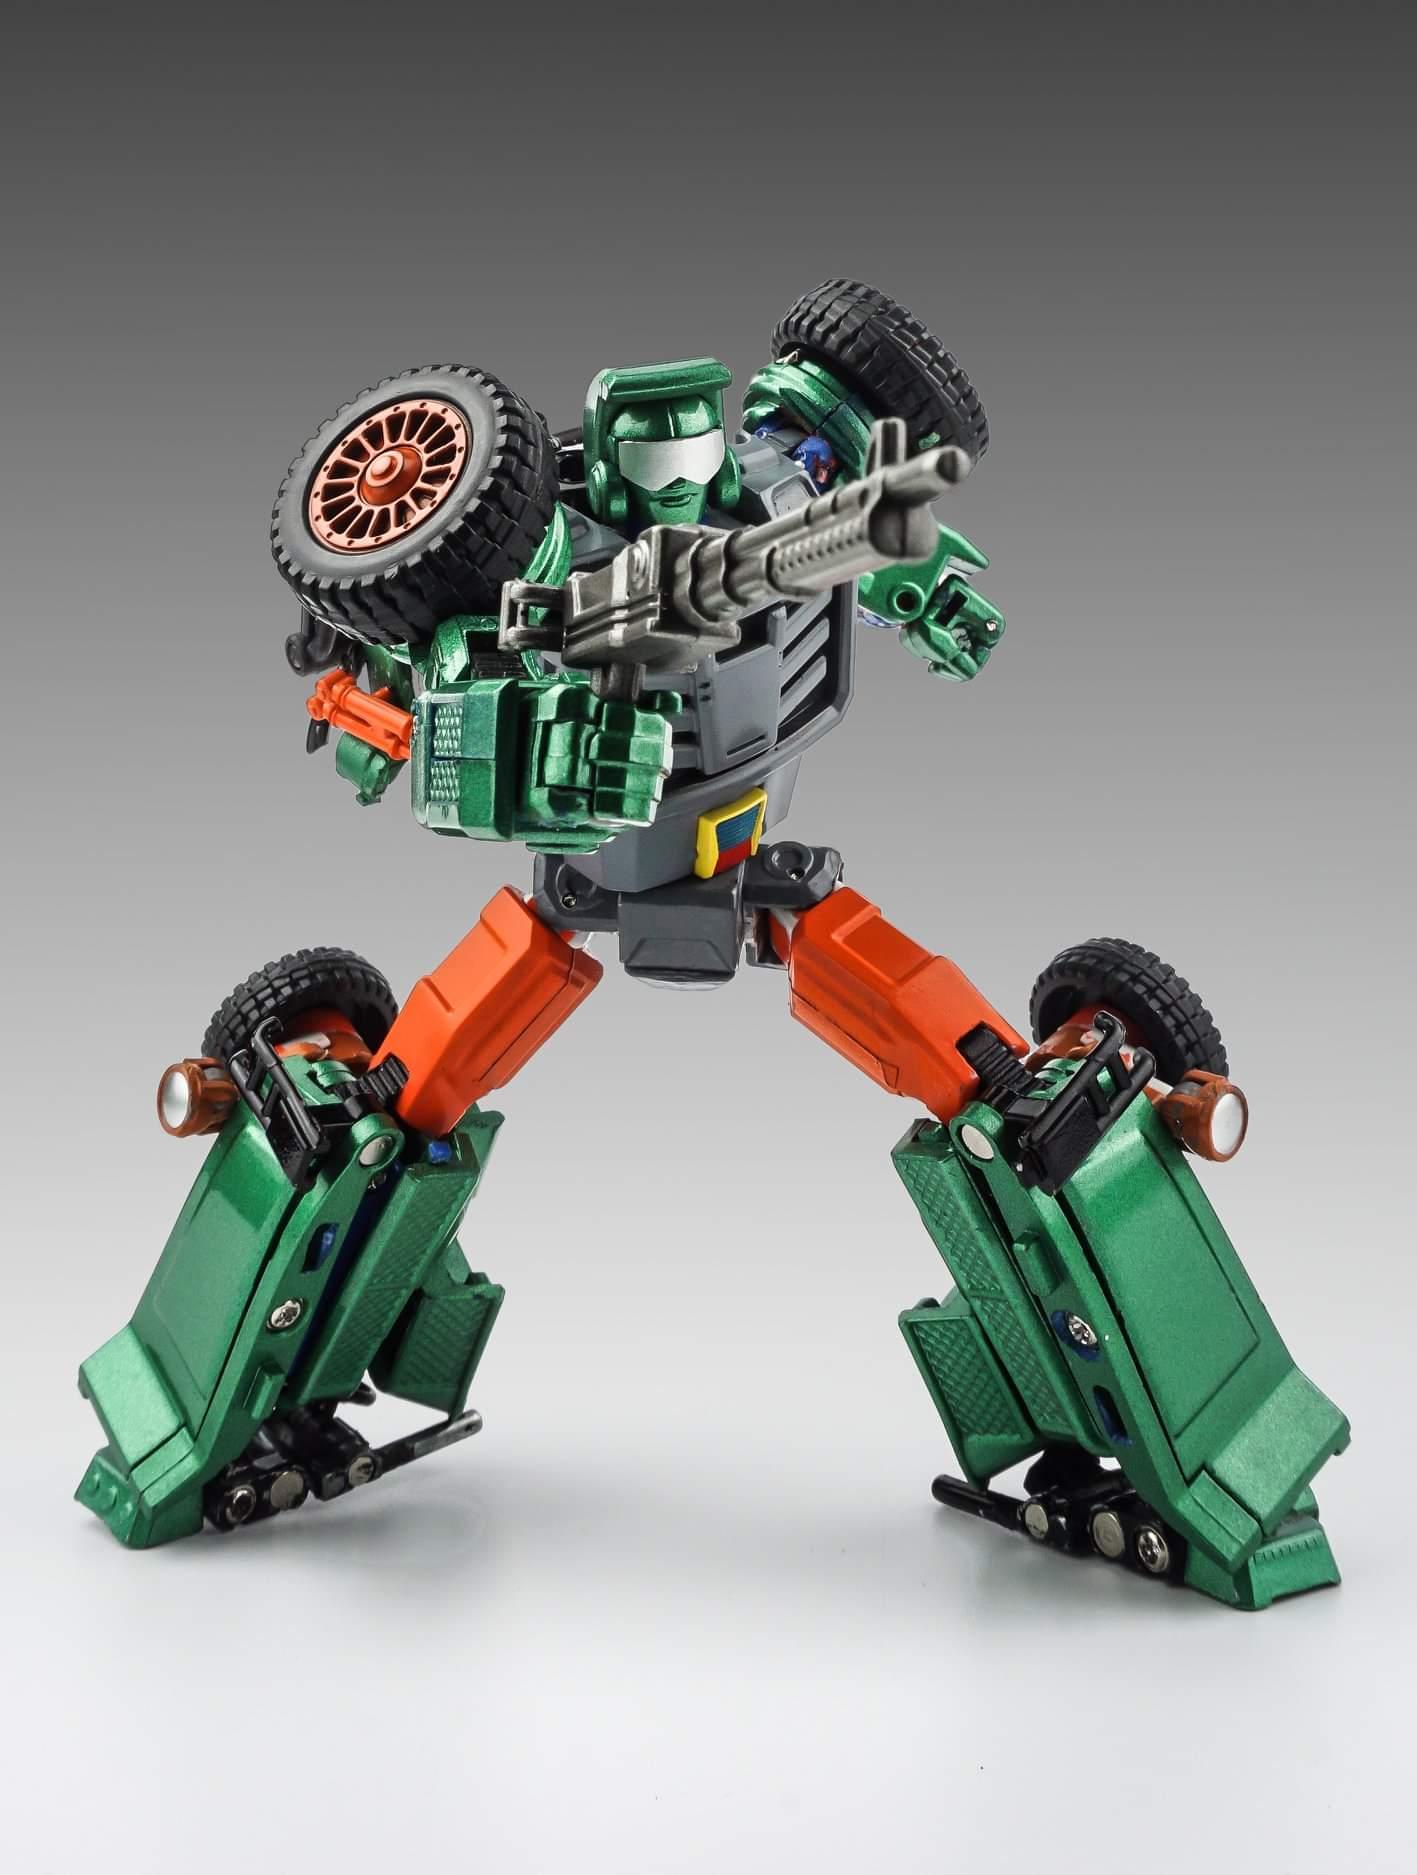 [X-Transbots] Produit Tiers - Minibots MP - Gamme MM - Page 12 P6BF3XKI_o